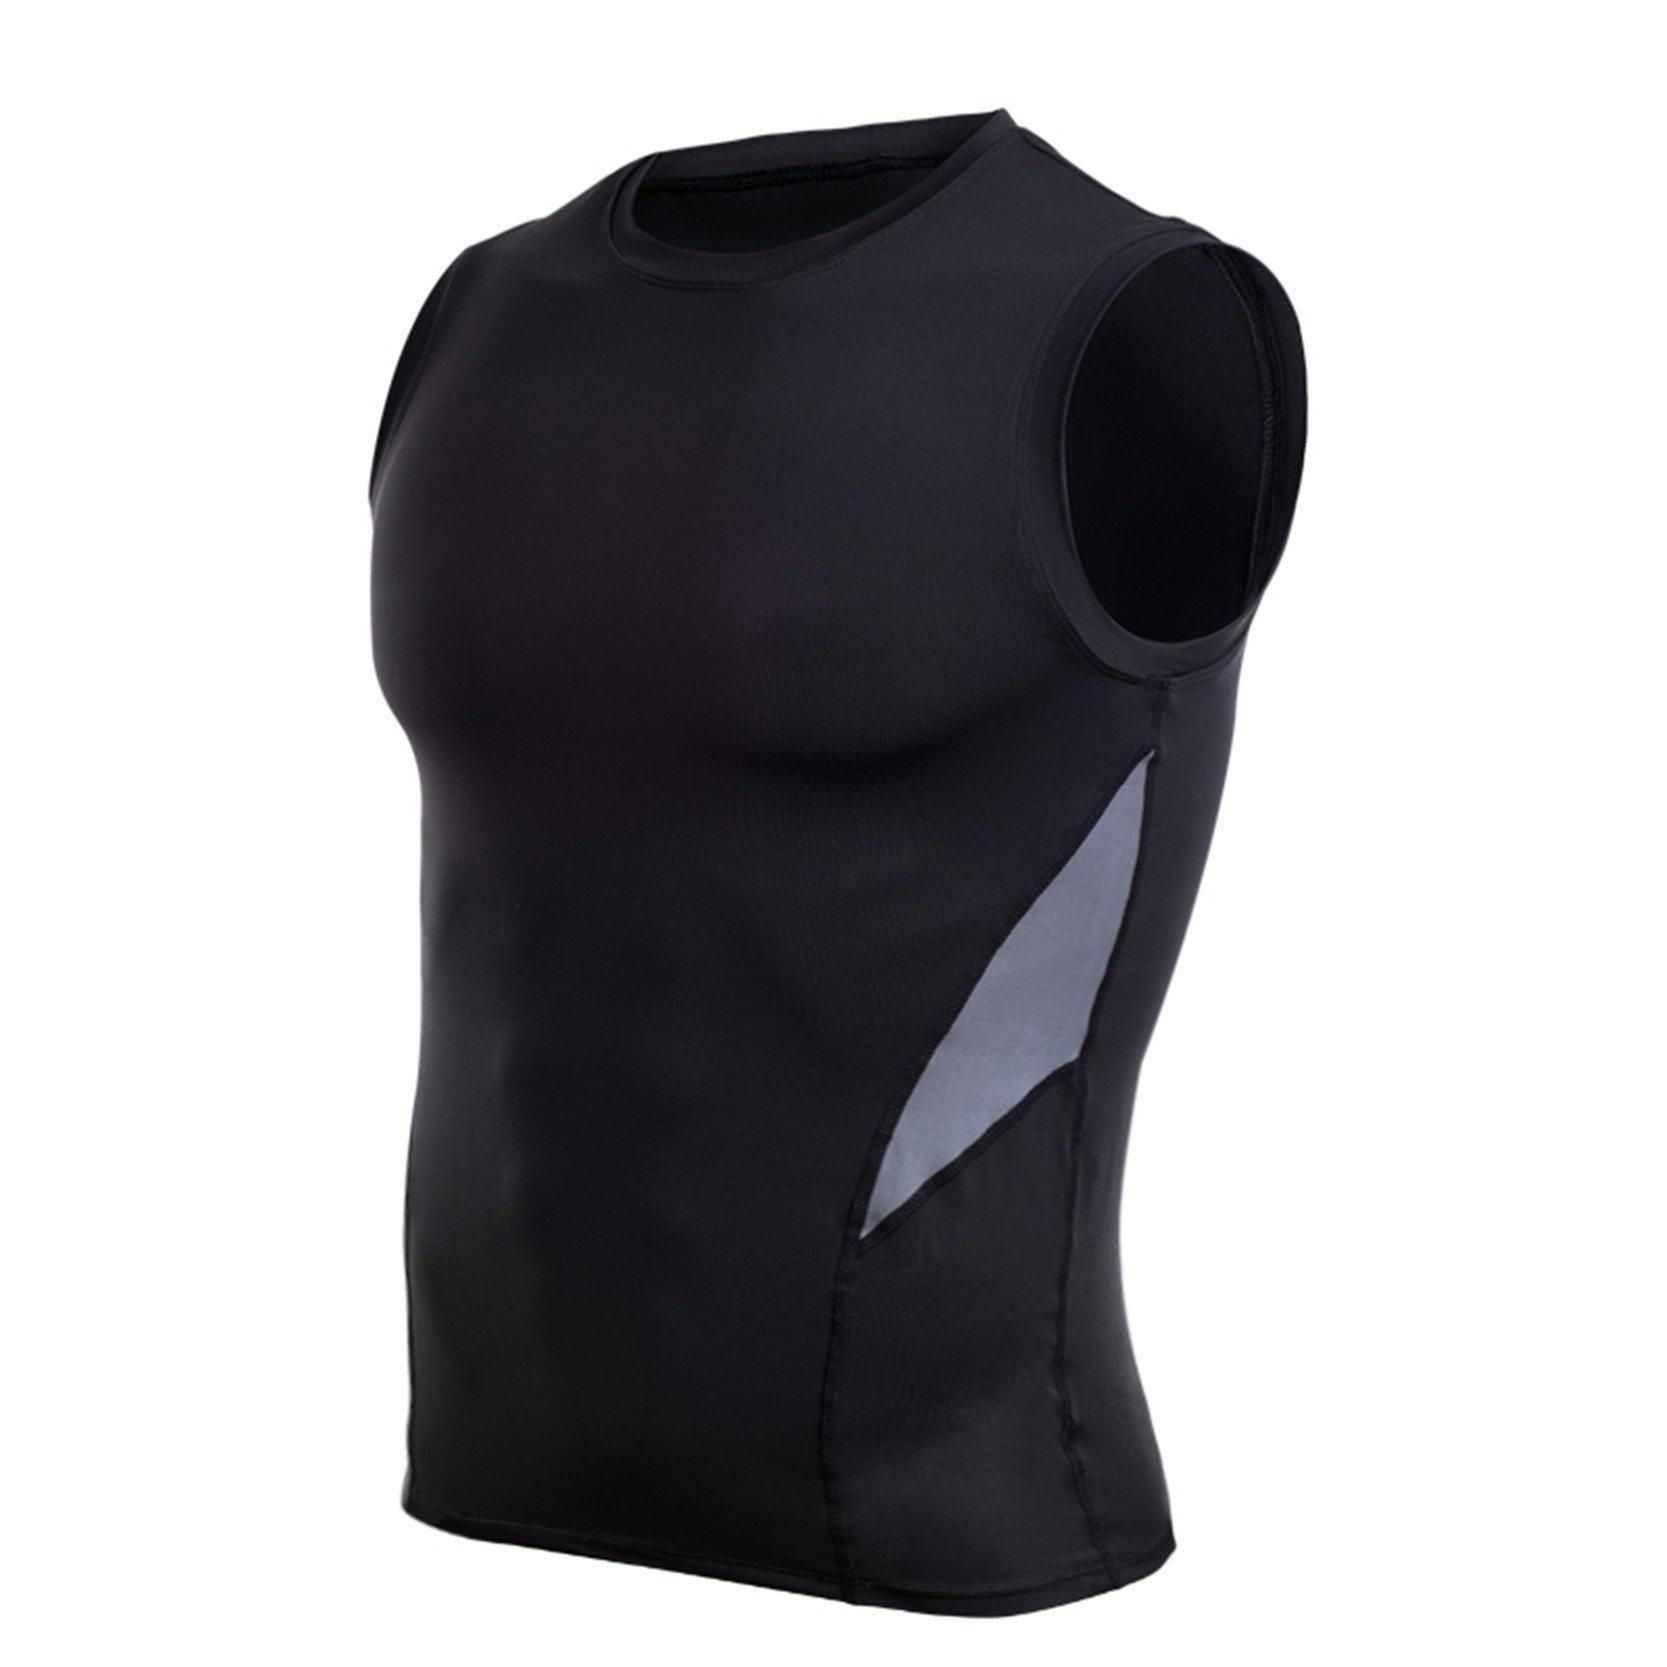 AIRAVATA Men's Sleeveless Cool Dry Breathable Elasticity Sportwear Compression Tank Top